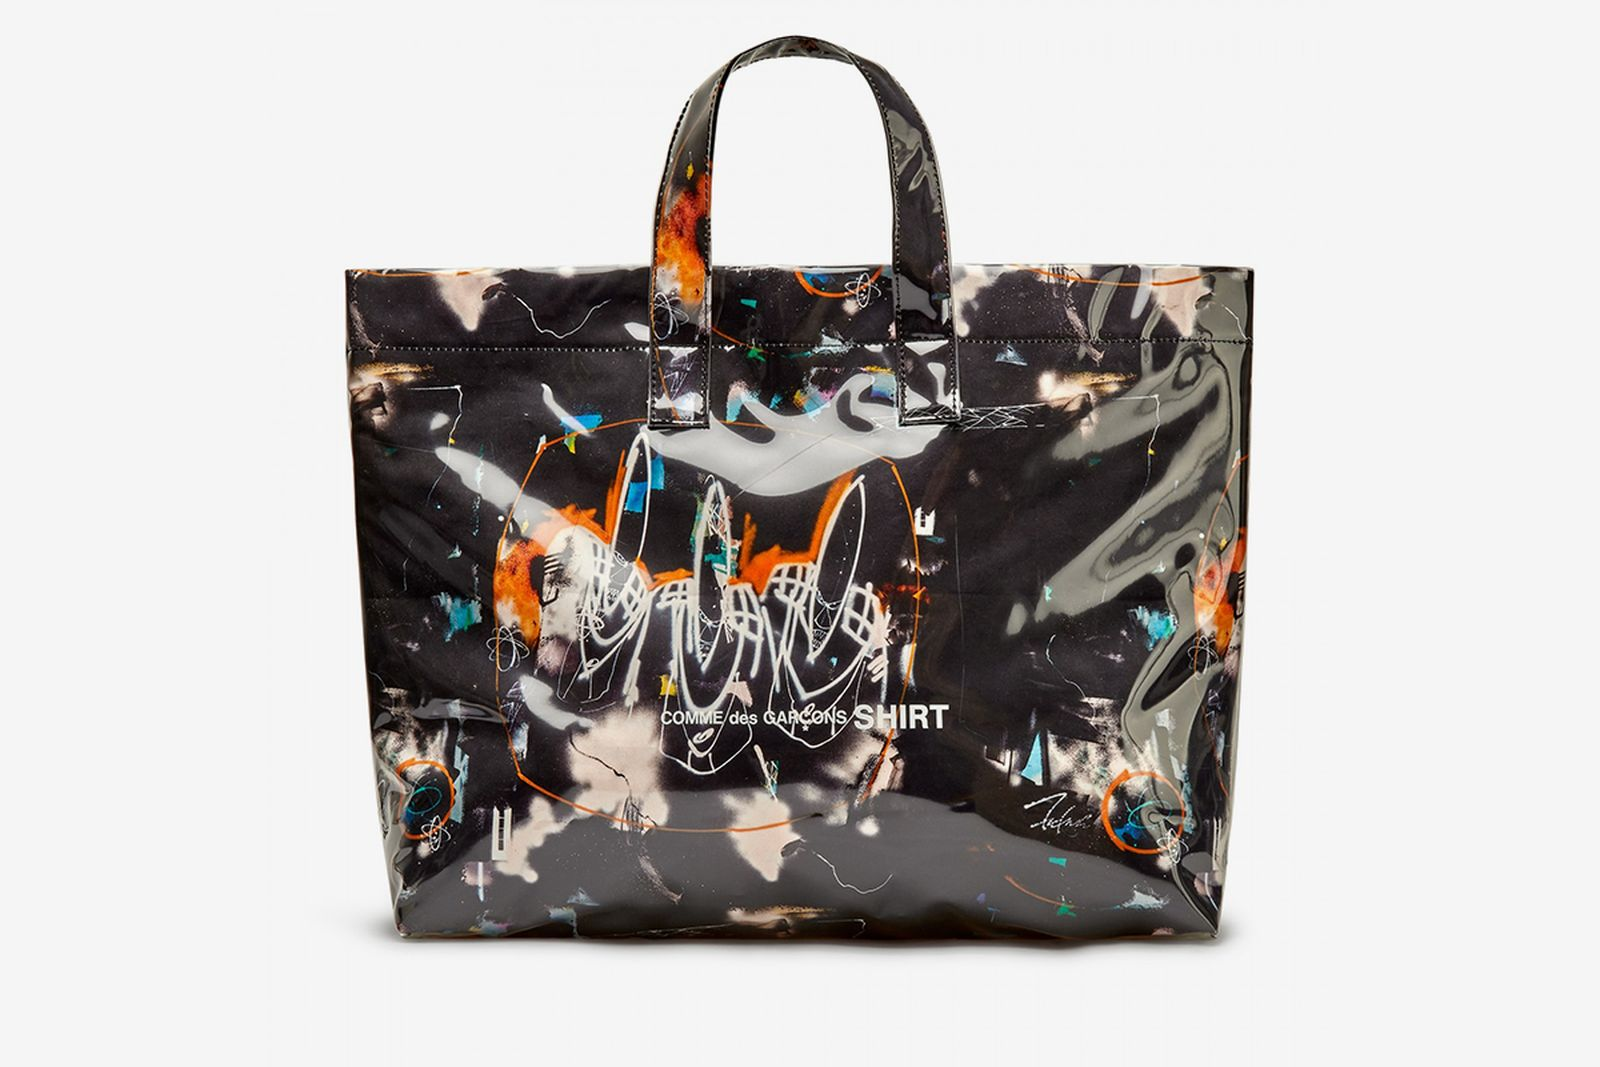 Futura x COMME des GARÇONS SHIRT bag